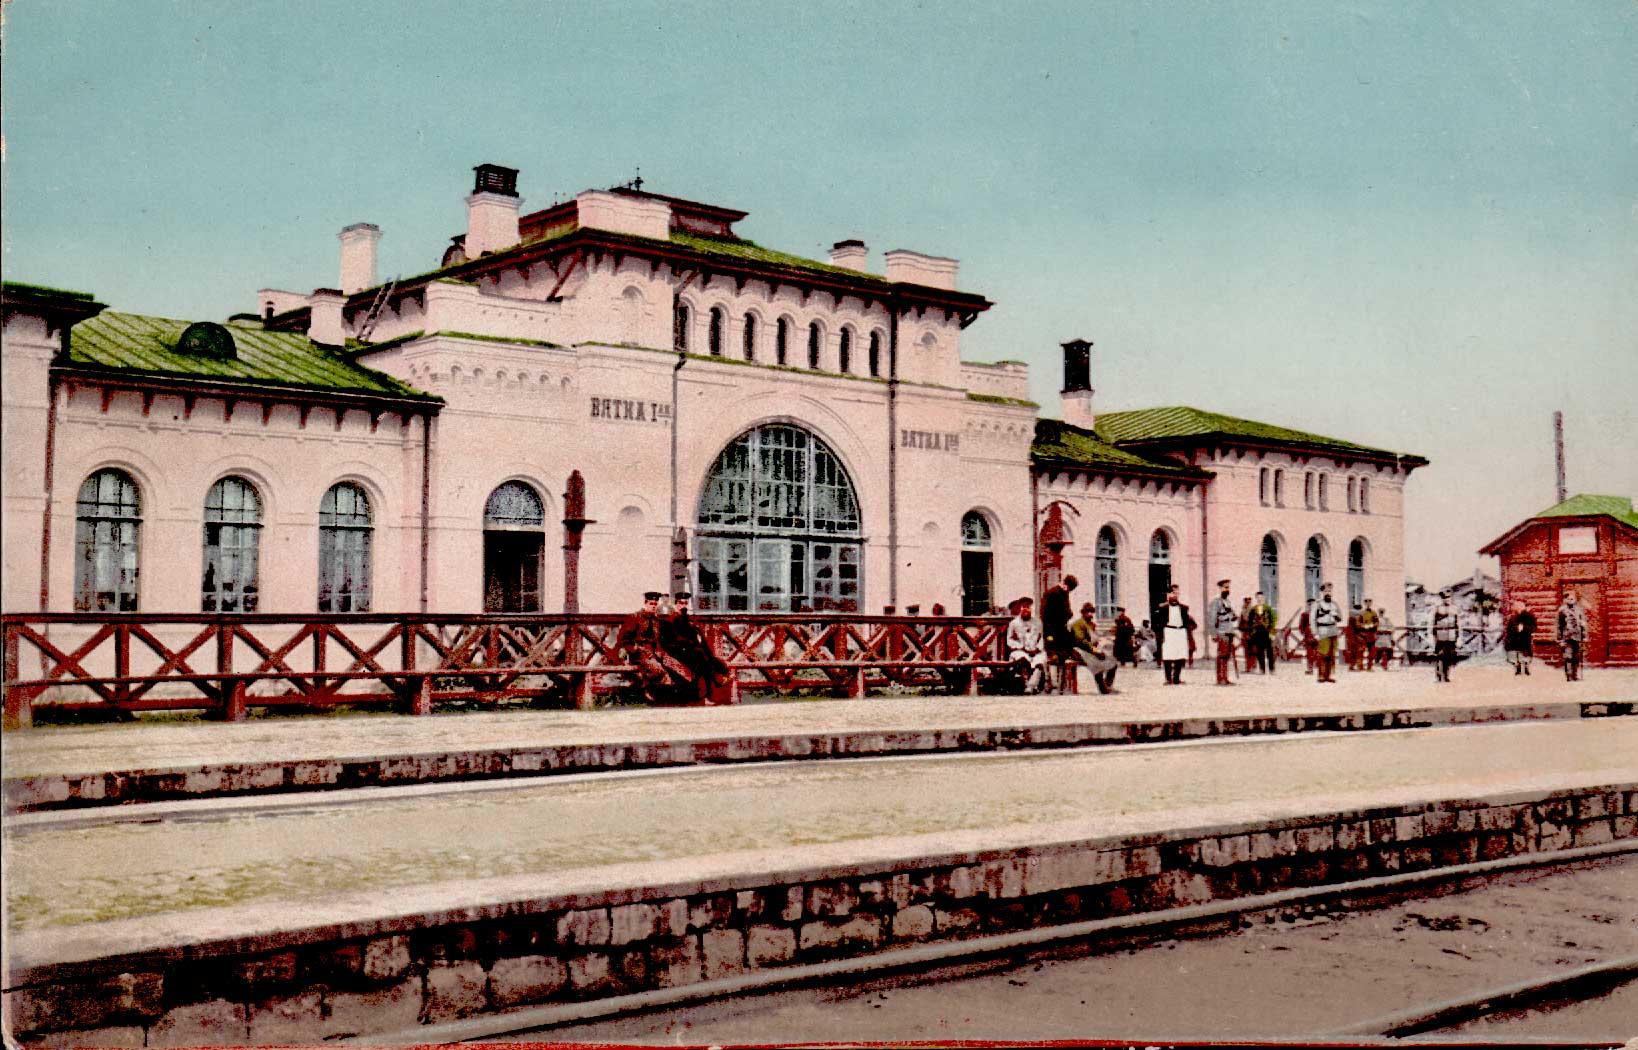 Вокзал станции «Вятка-1». Общий вид от платформы